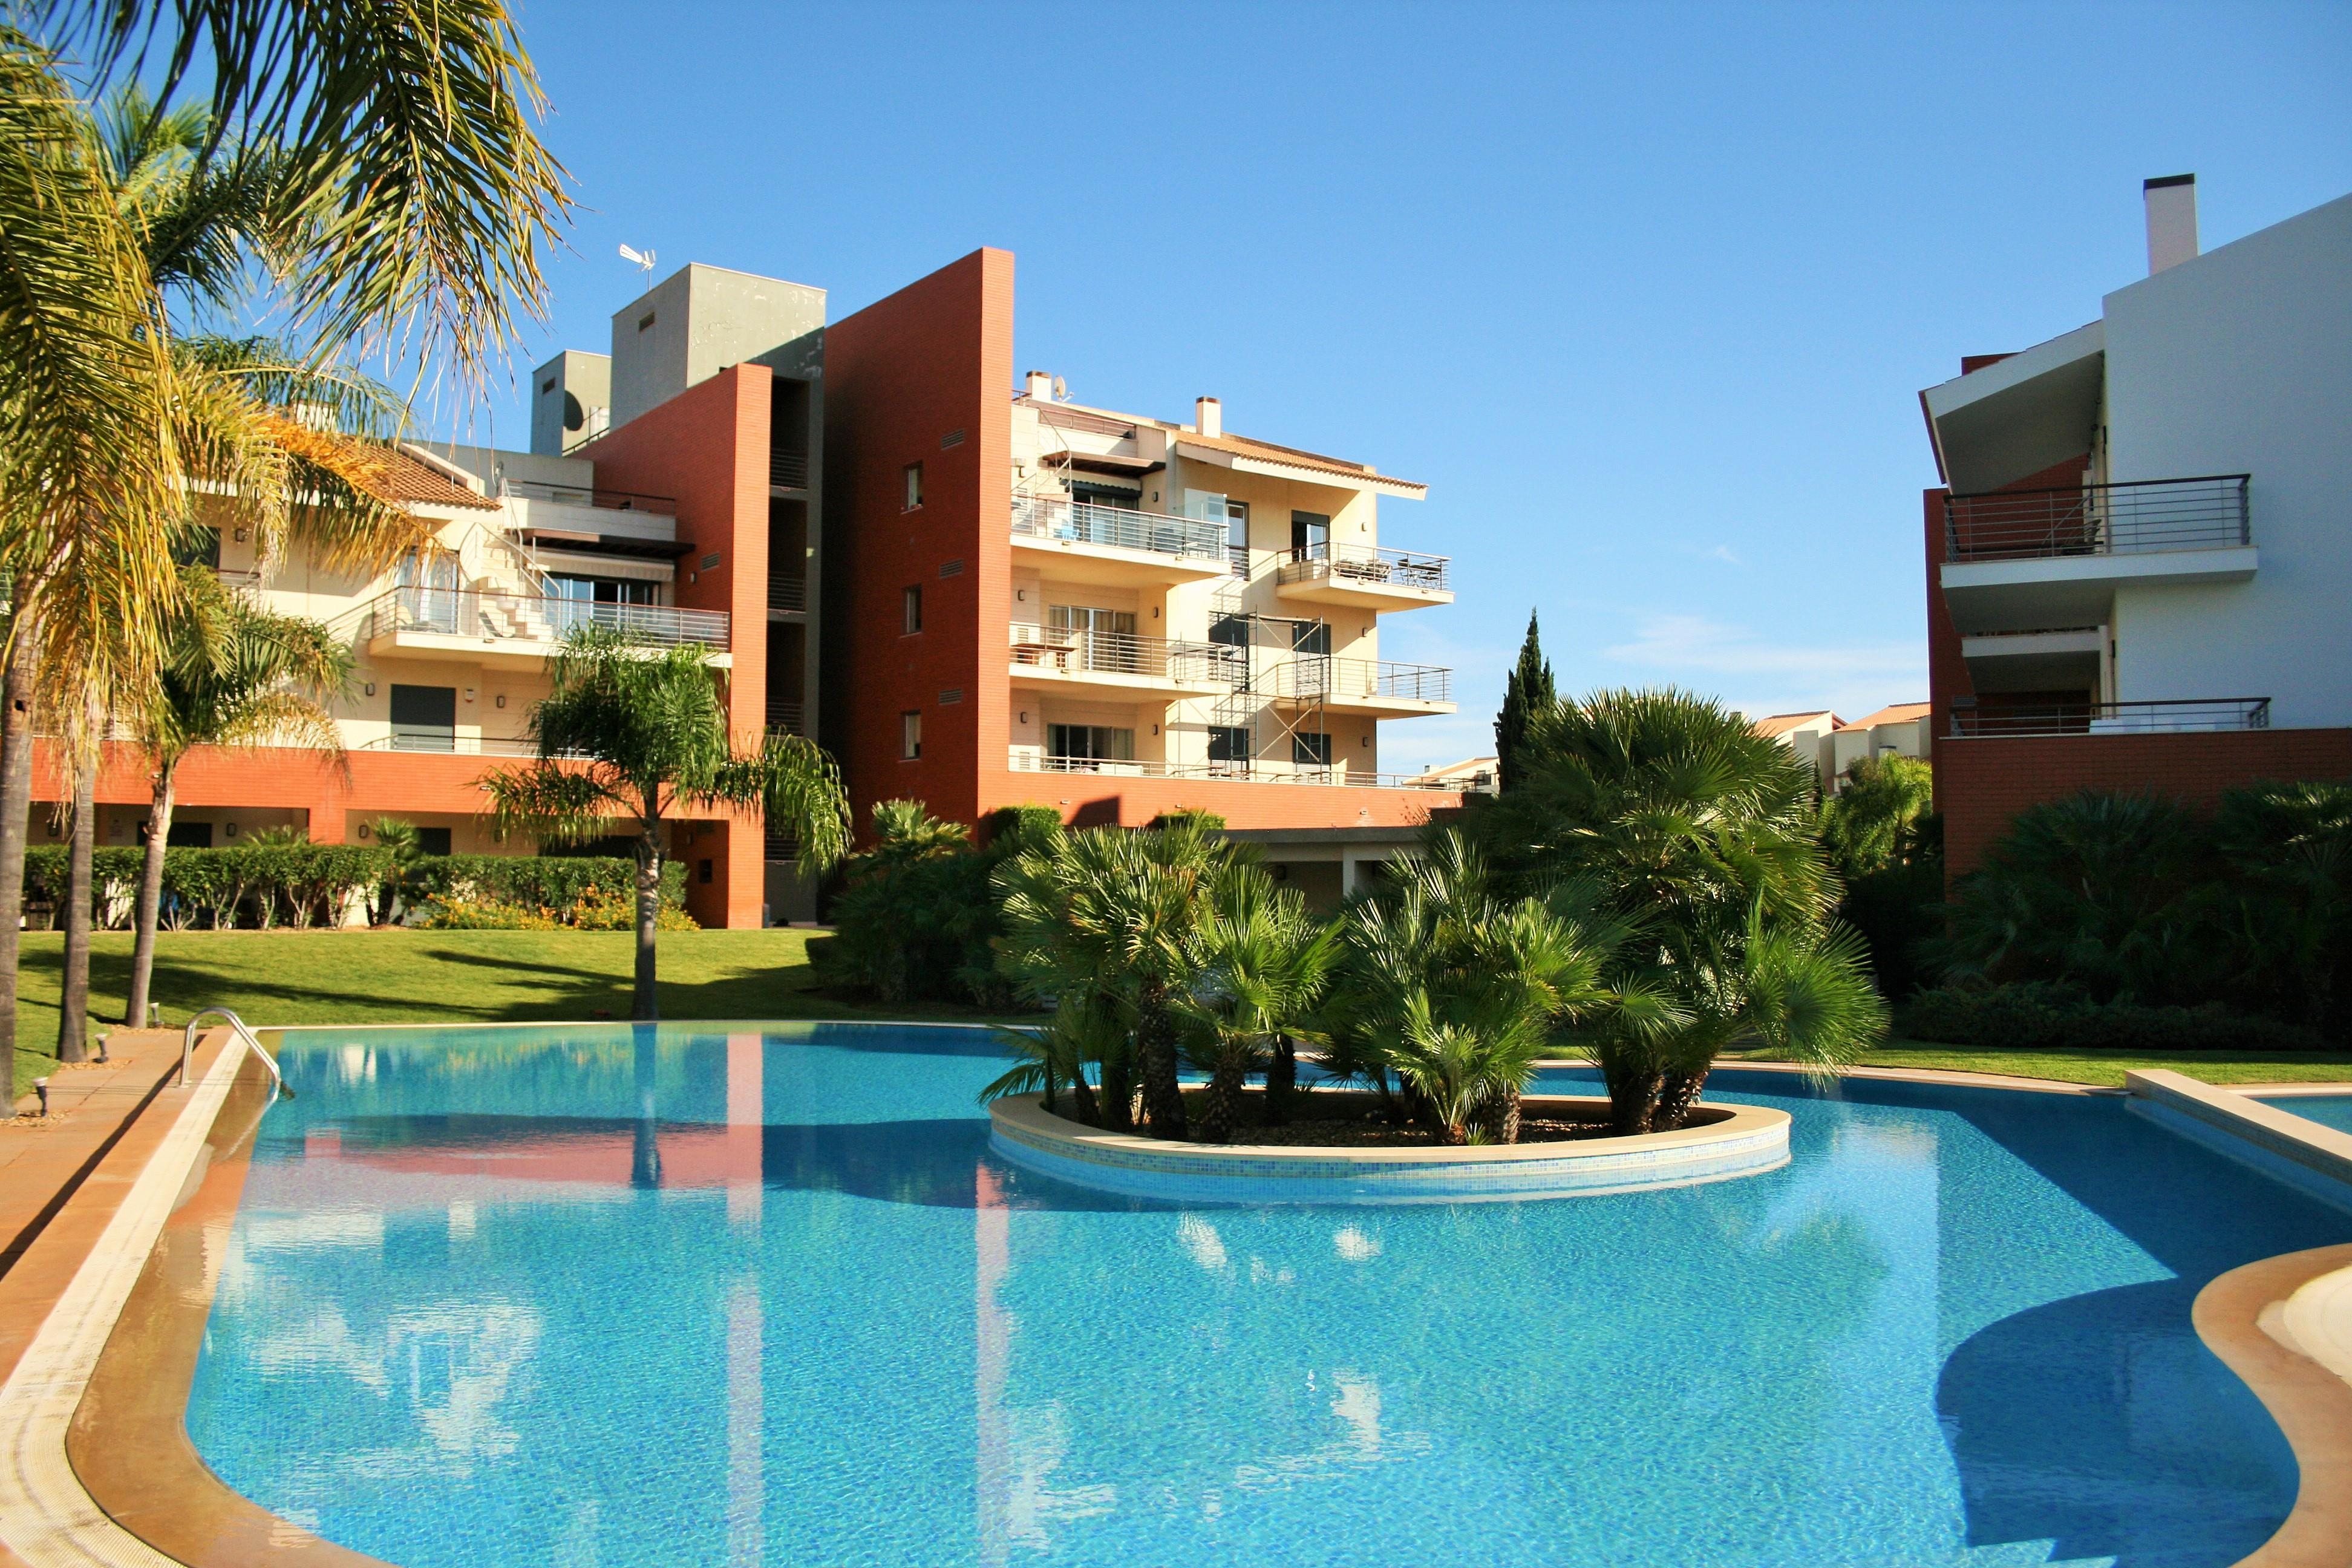 複式單位 為 出售 在 Duplex, 3 bedrooms, for Sale Loule, Algarve, 葡萄牙